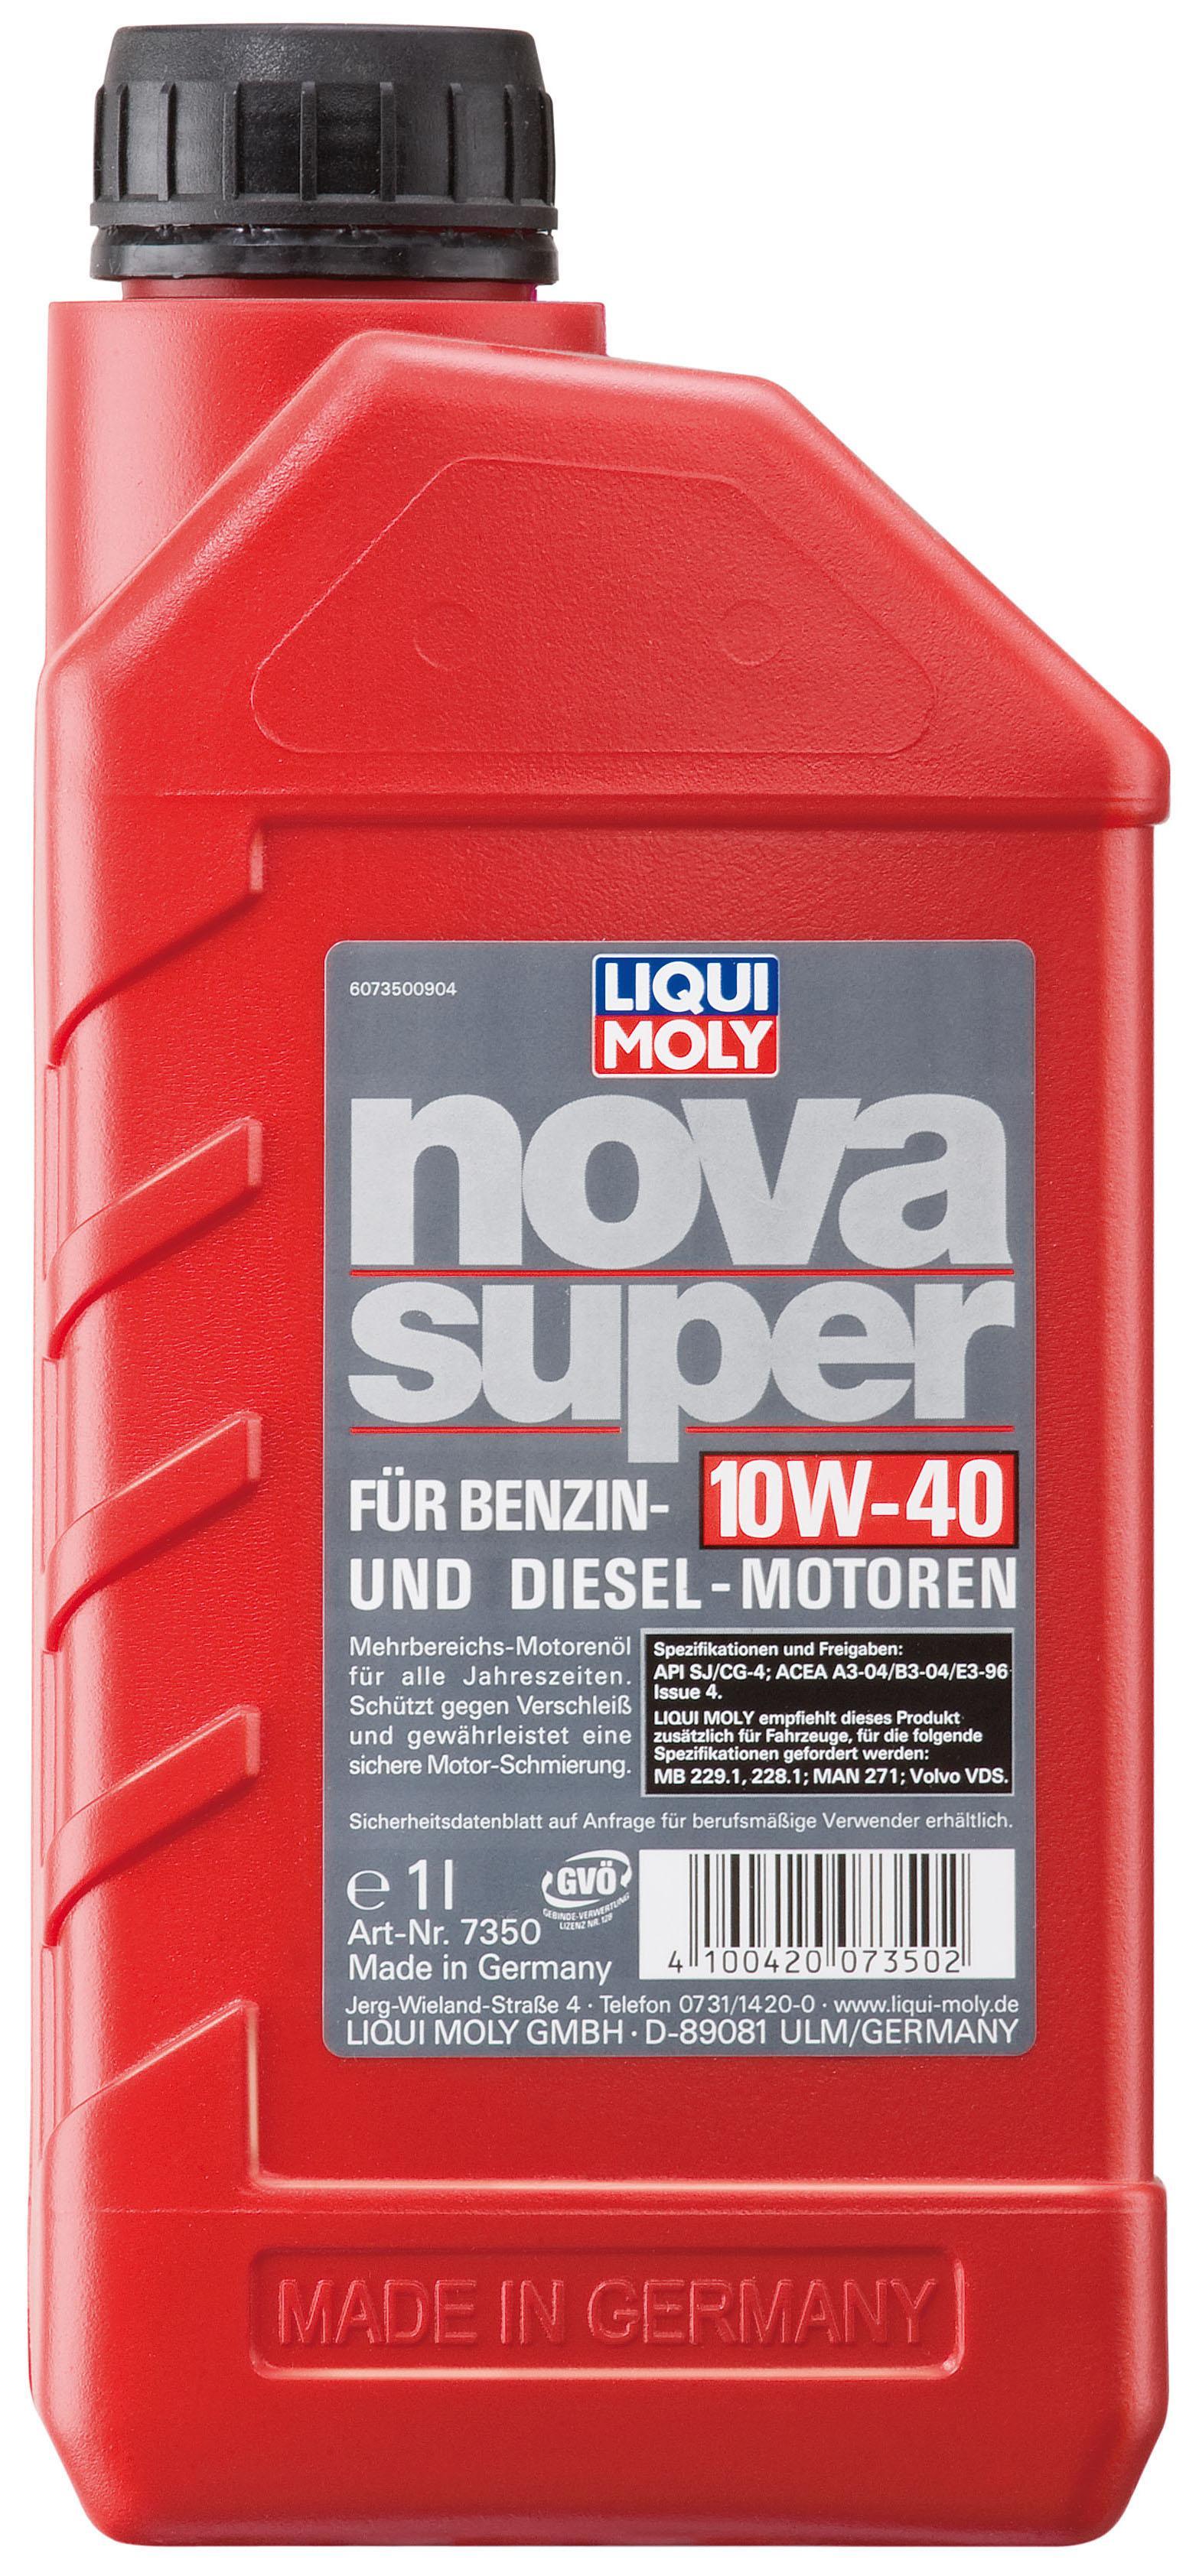 Motoröl 7350 LIQUI MOLY VolvoVDS in Original Qualität